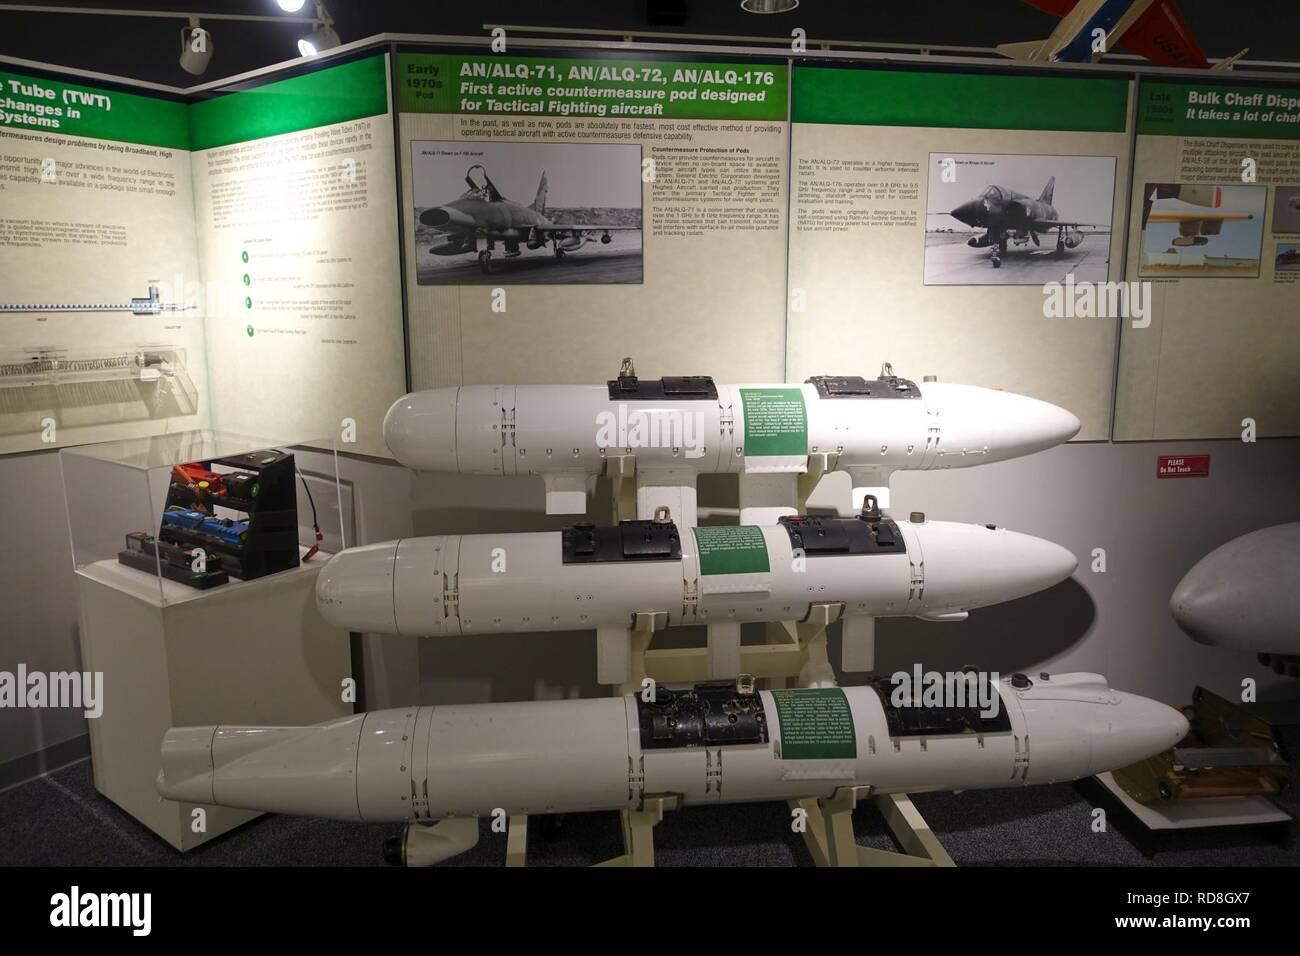 AN-ALQ-71, AN-ALQ-72, and AN-ALQ-176 countermeasure pods - - Stock Image